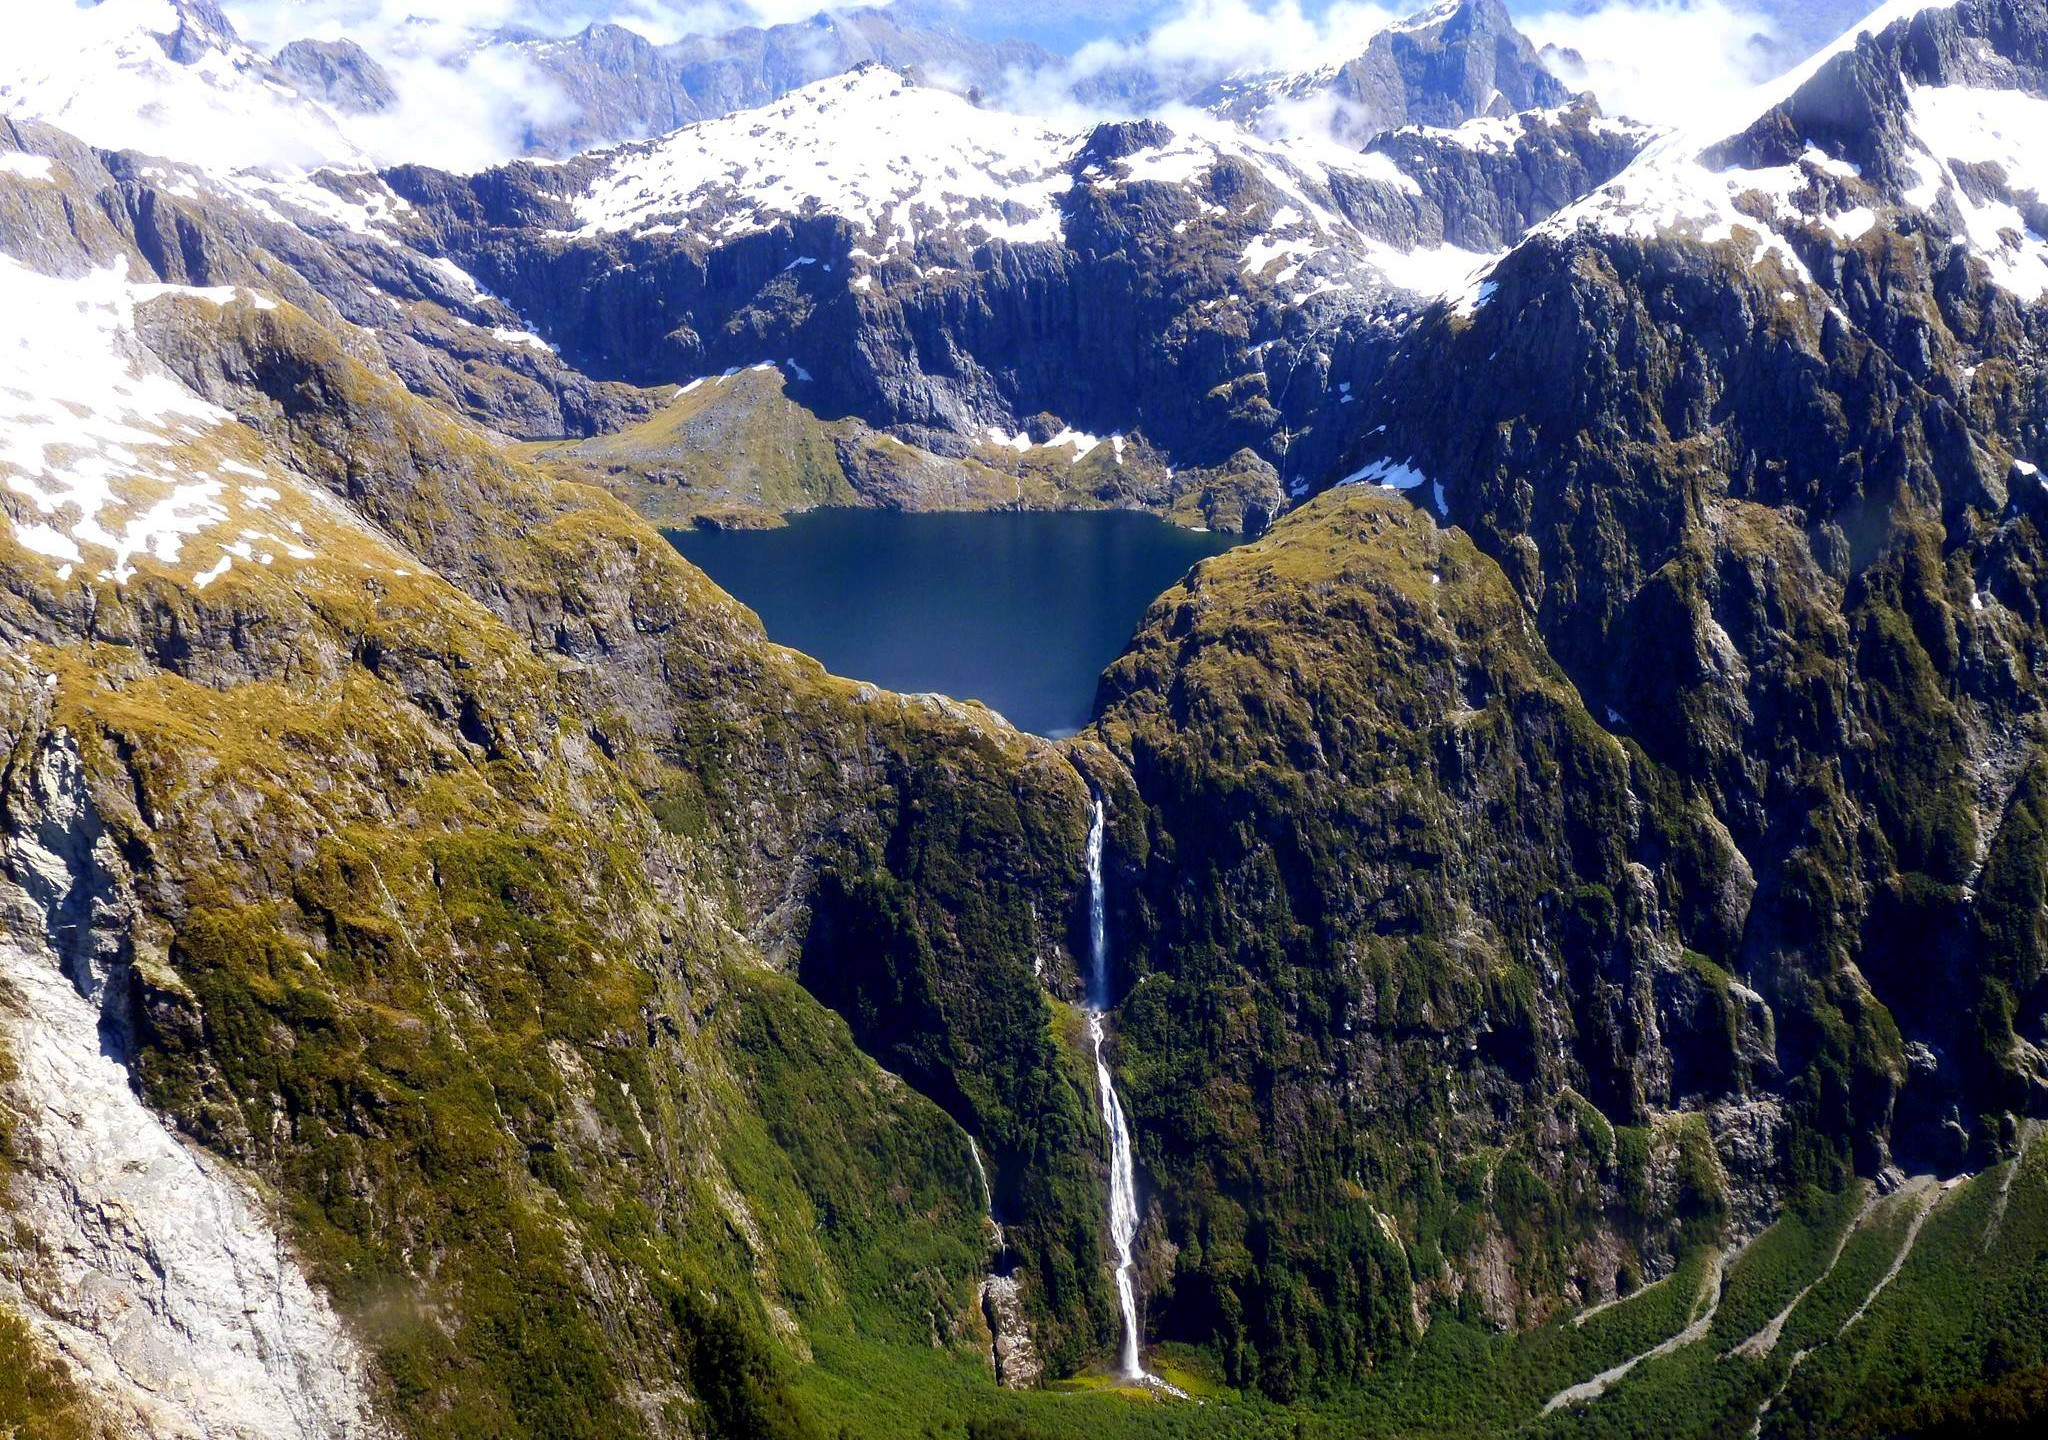 Sutherland waterfall, Fiordland, New Zealand attractions, New Zealand activities